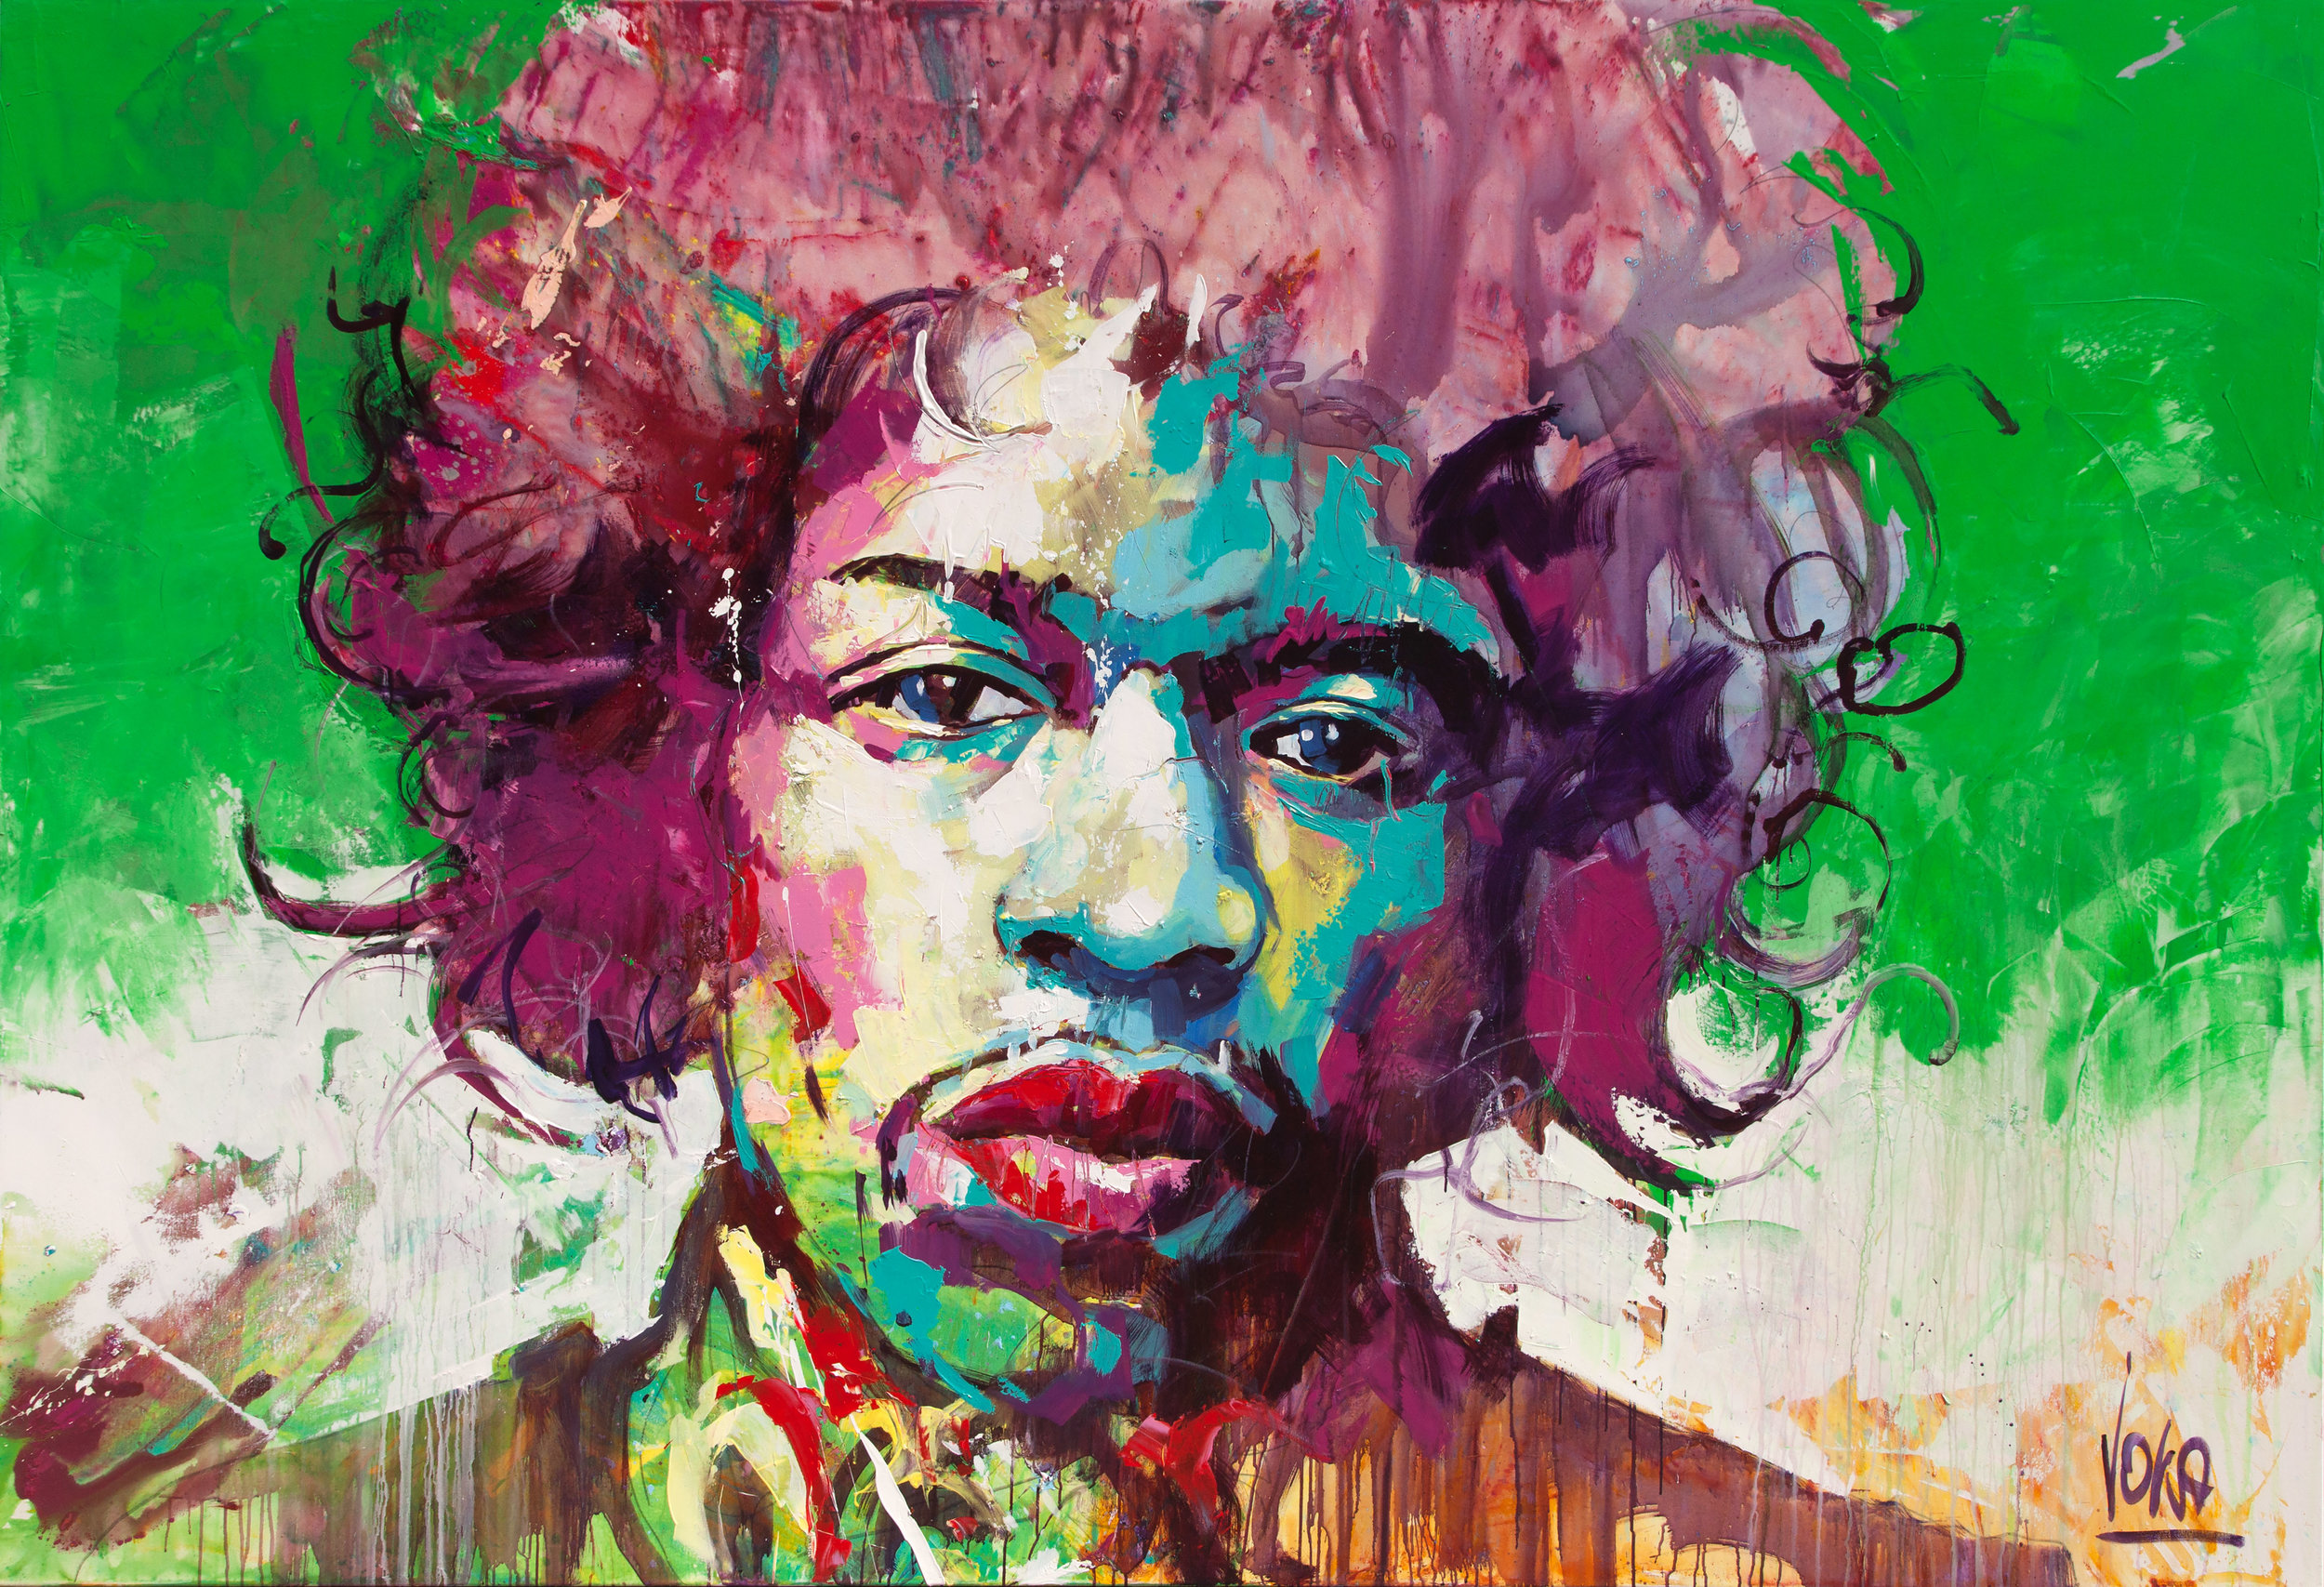 Hendrix, 190x280 cm/74,8x110,2 inch, Acrylic on Canvas